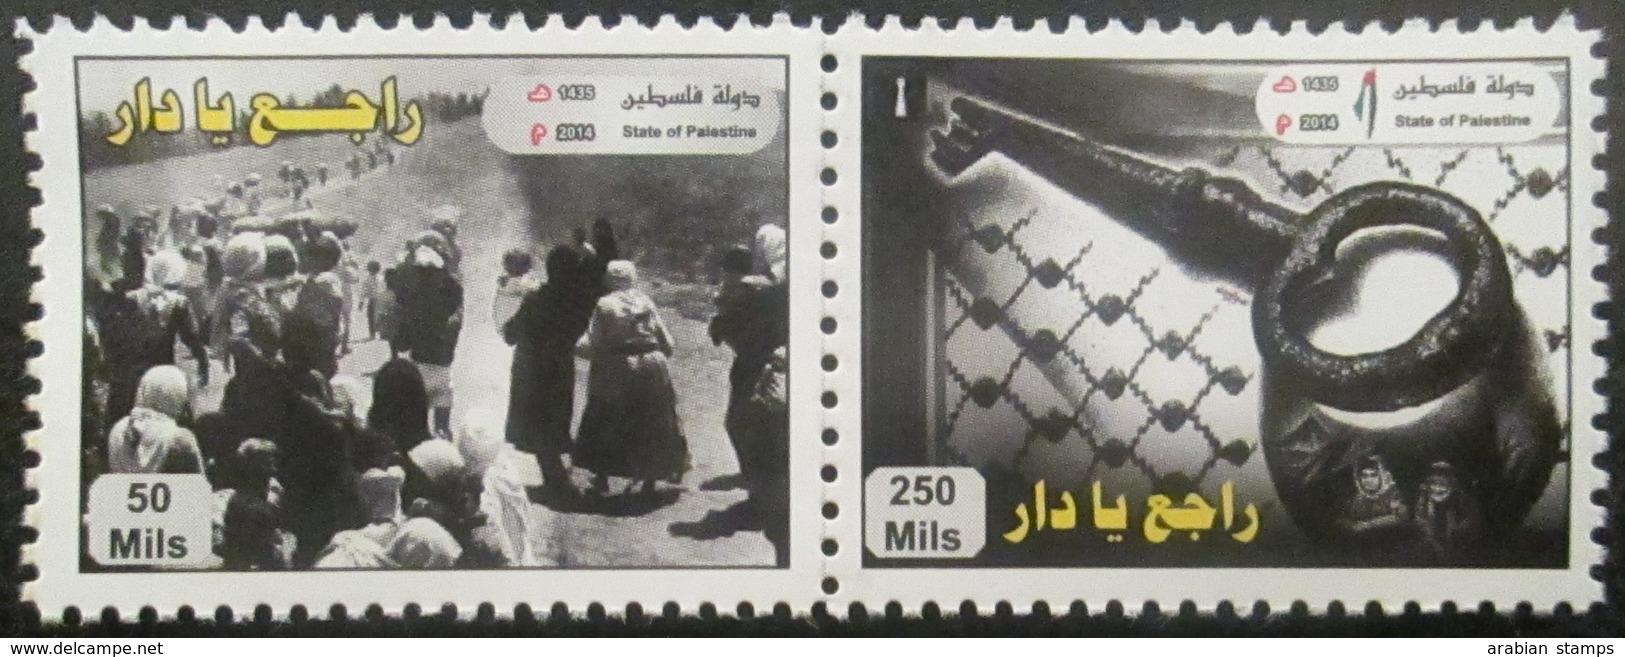 STATE OF PALESTINE 2014 PALESTINIAN PALESTINE 66TH ANNIVERSARY OF NAKBA PAINTINGS UNUSUAL PAIR - Palestina